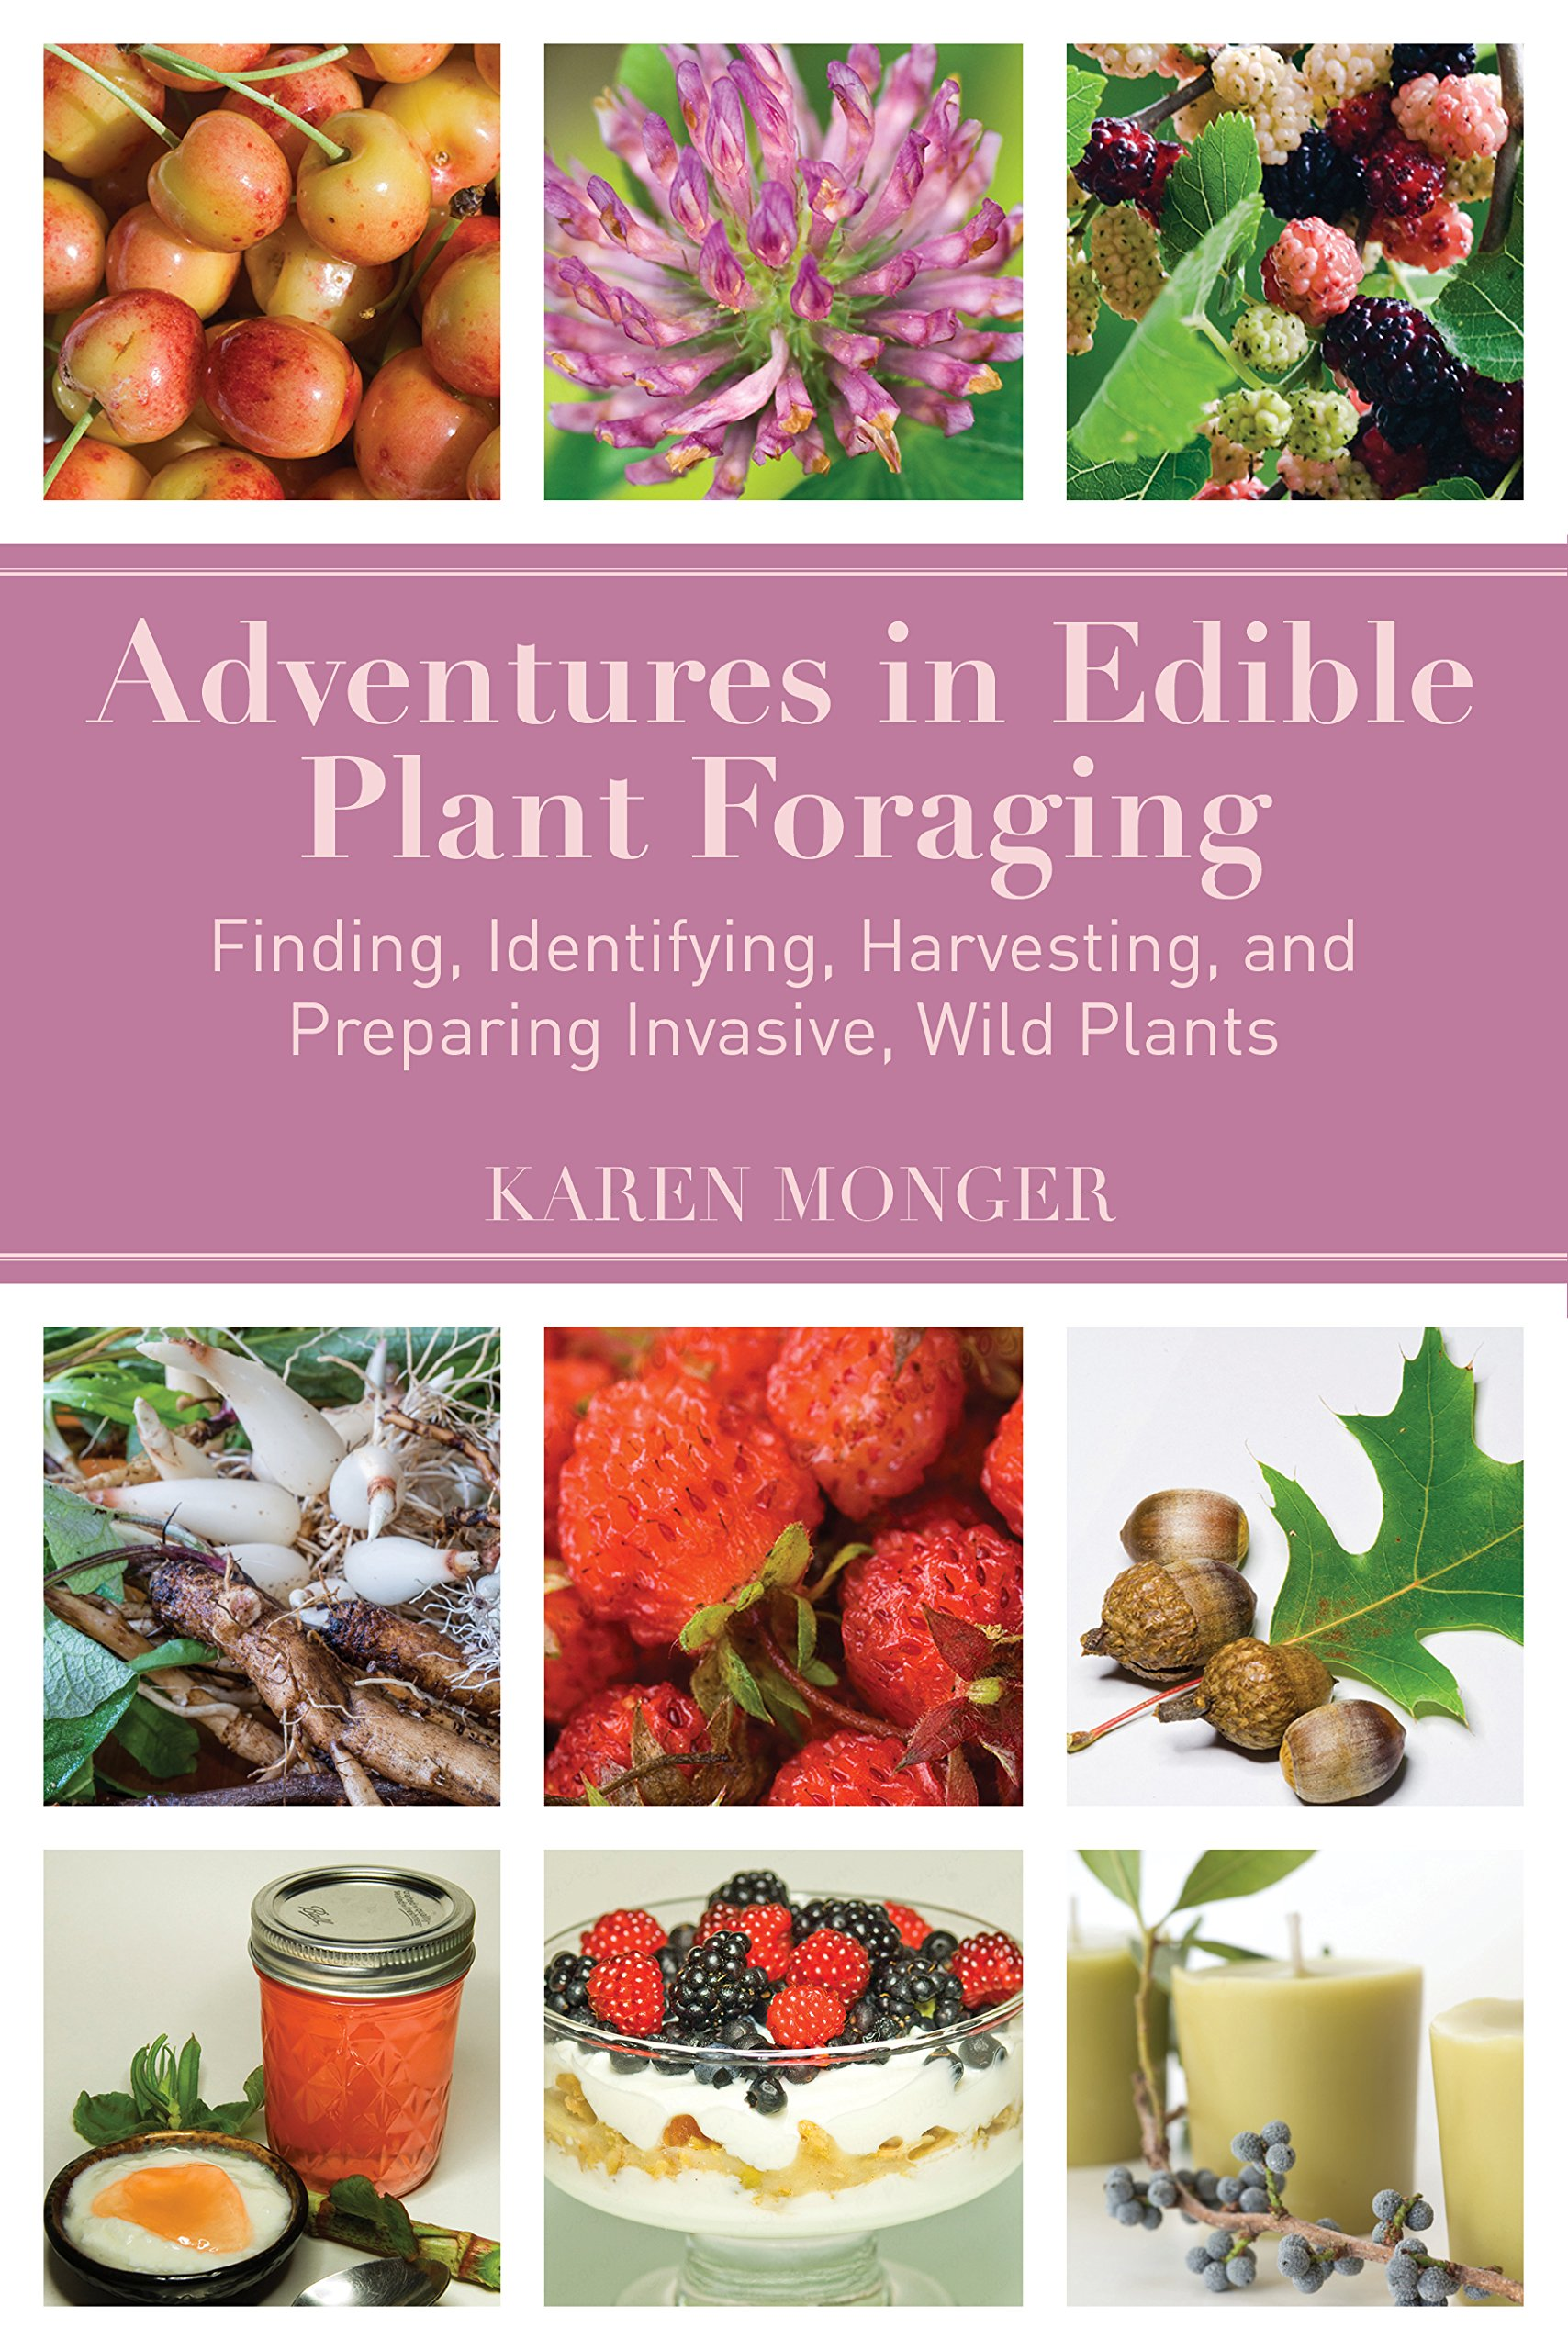 Adventures in Edible Plant Foraging: Finding, Identifying, Harvesting, and Preparing  Native and Invasive Wild Plants: Karen Monger: 9781634504072: ...